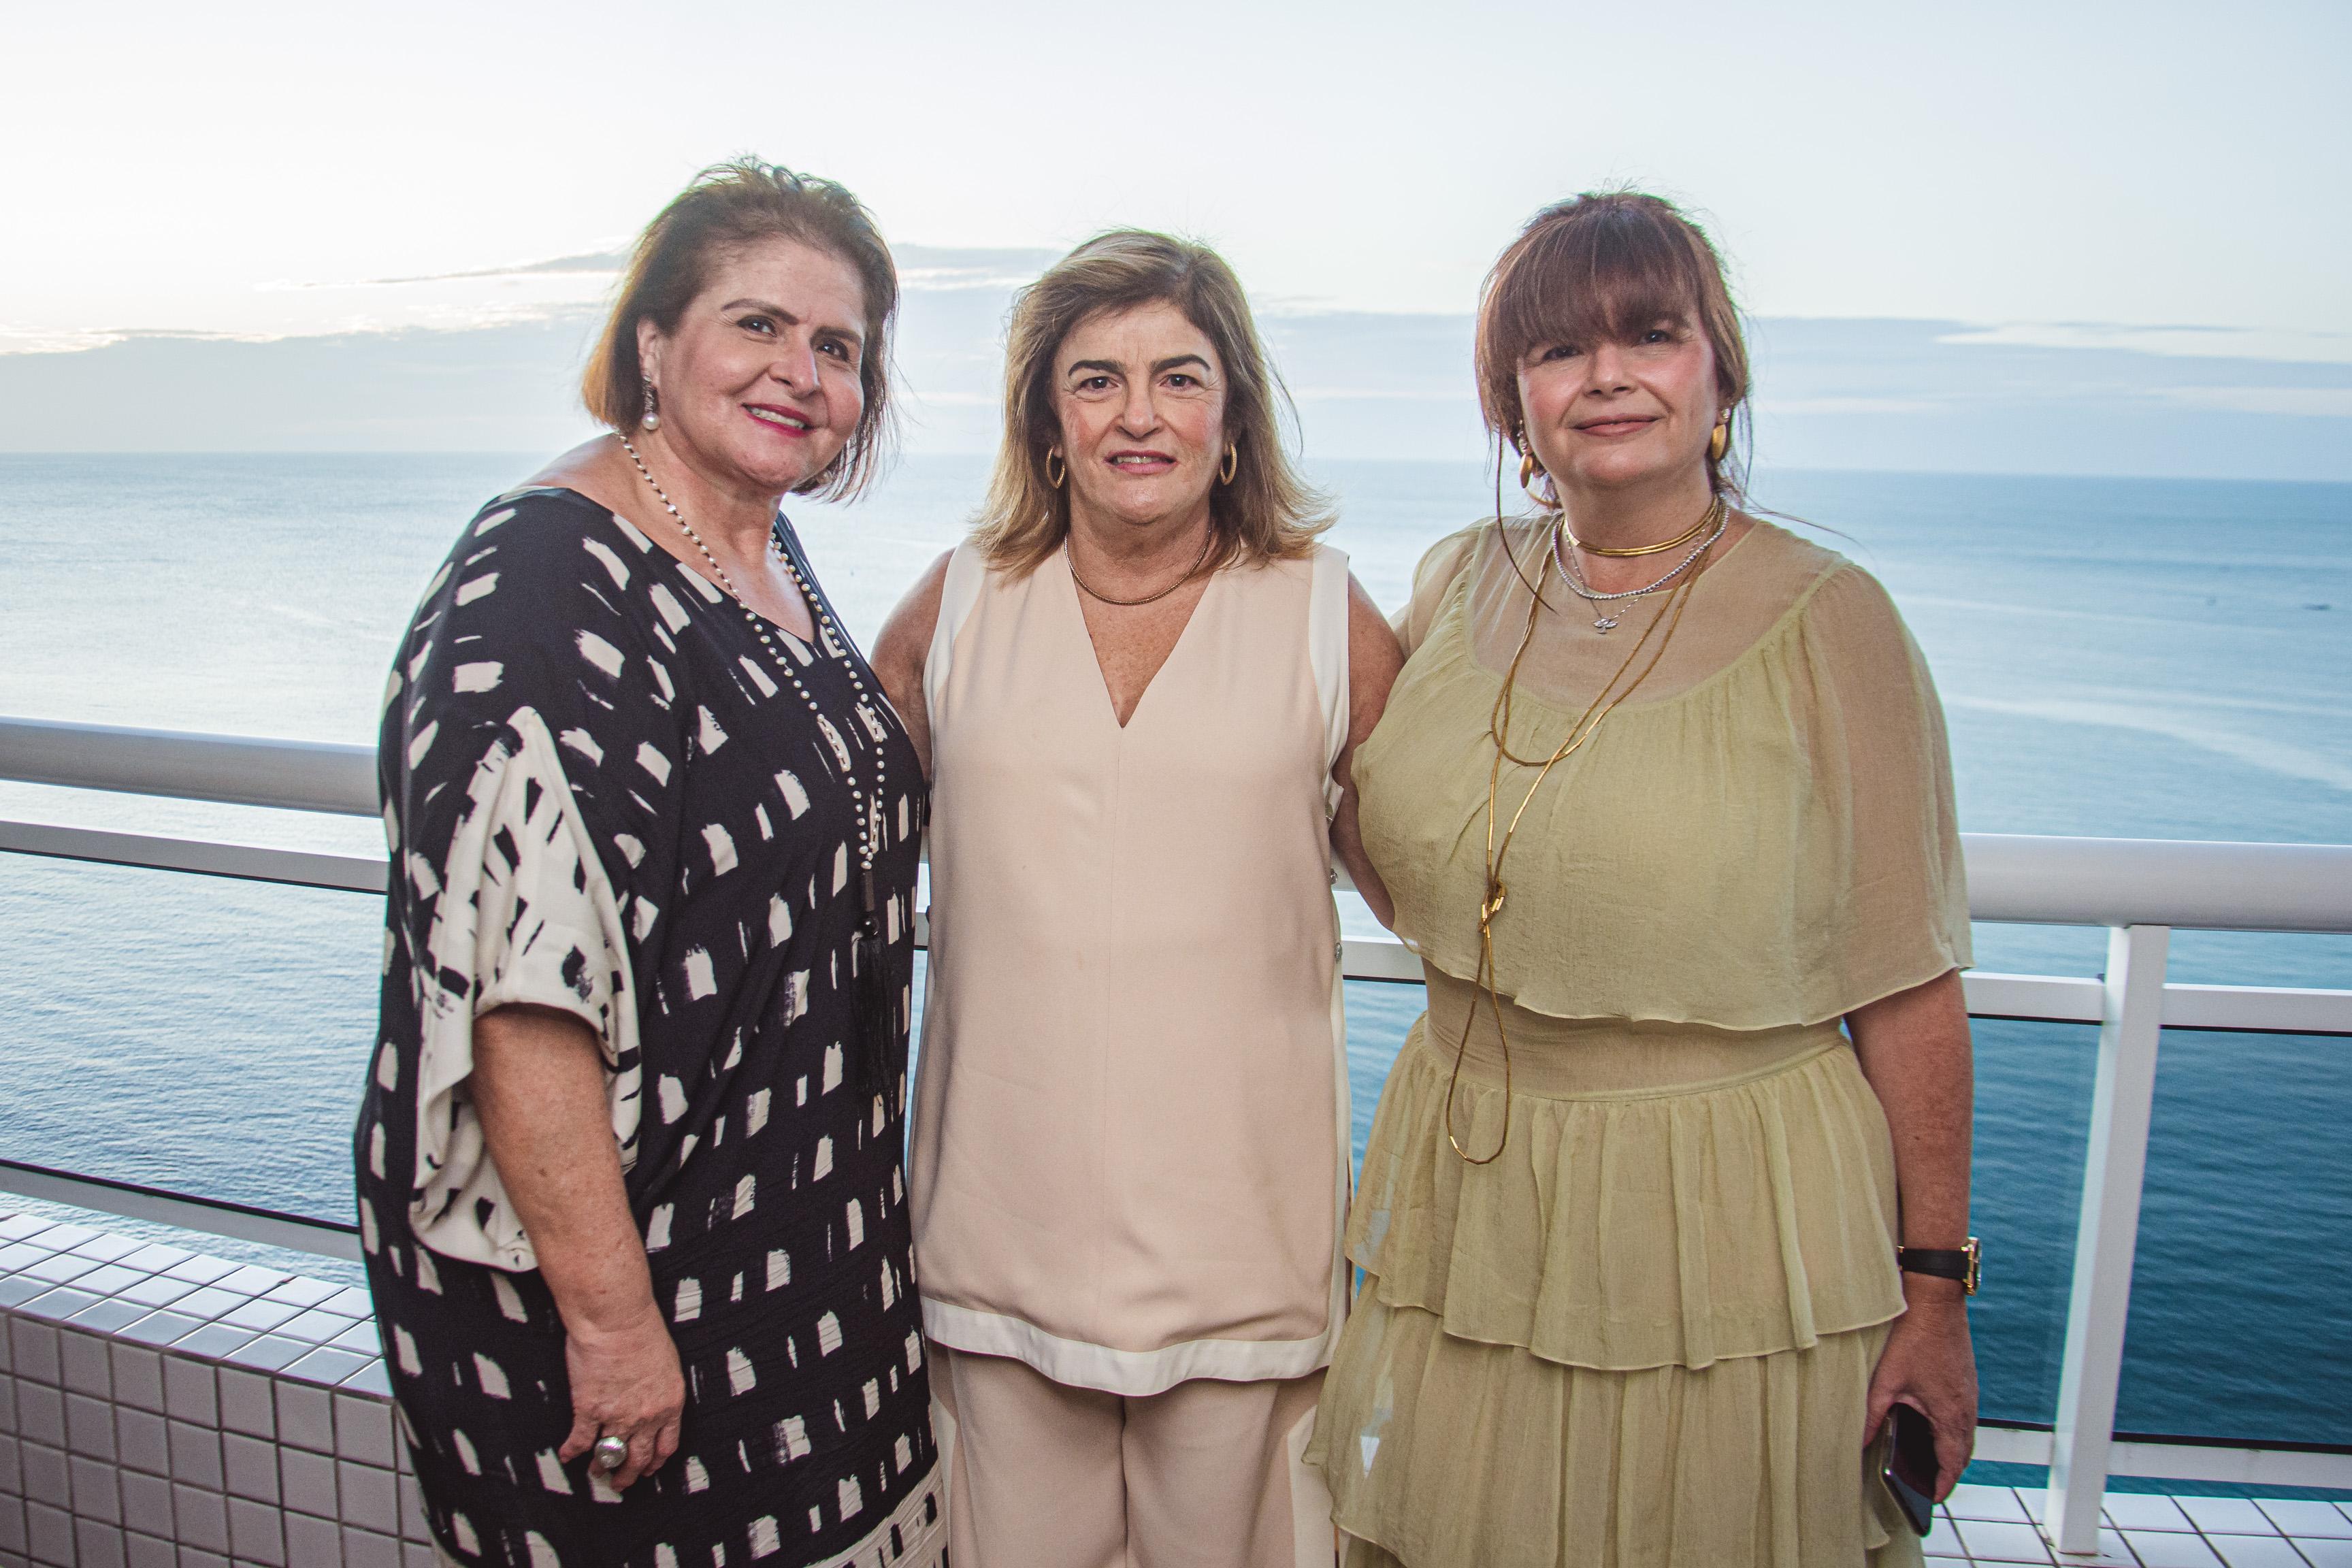 Lilia Freitas, Carla Lima E Nana Lima